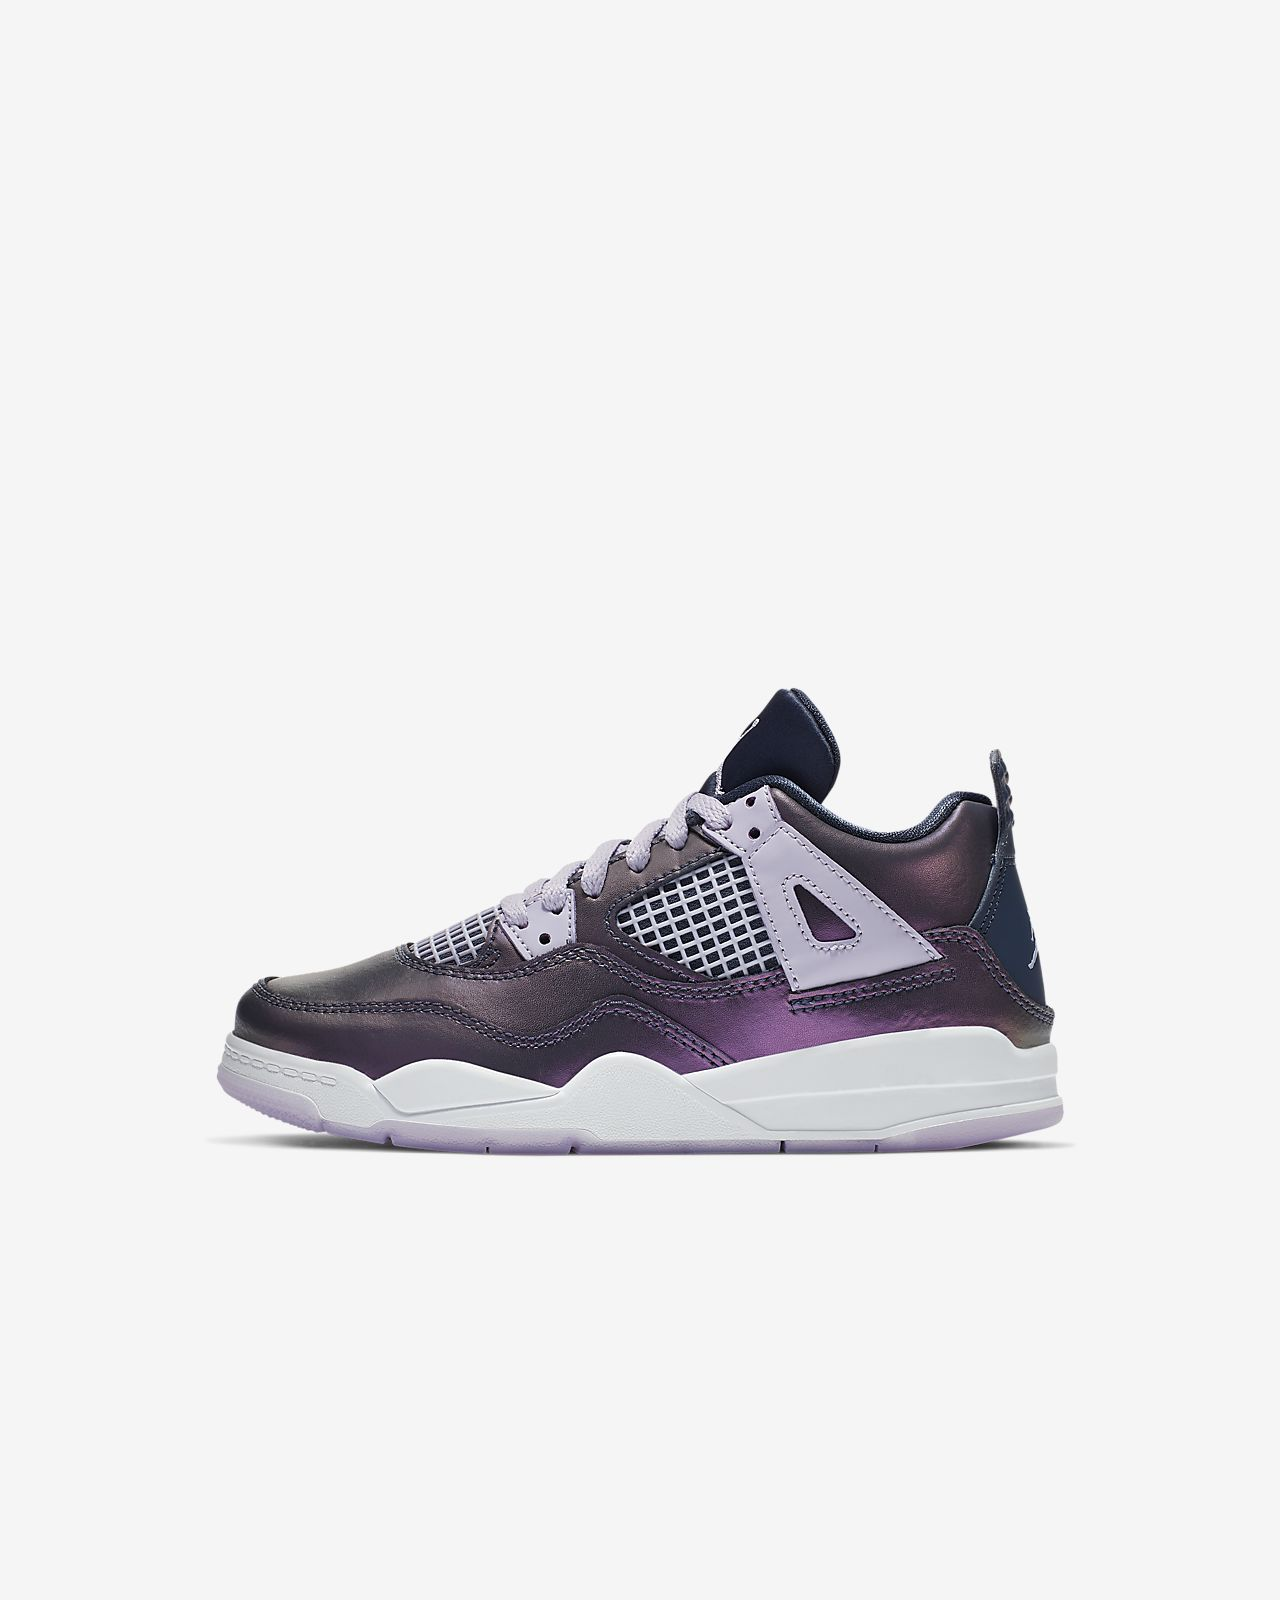 Jordan 4 Retro SE(PS) 复刻幼童运动童鞋